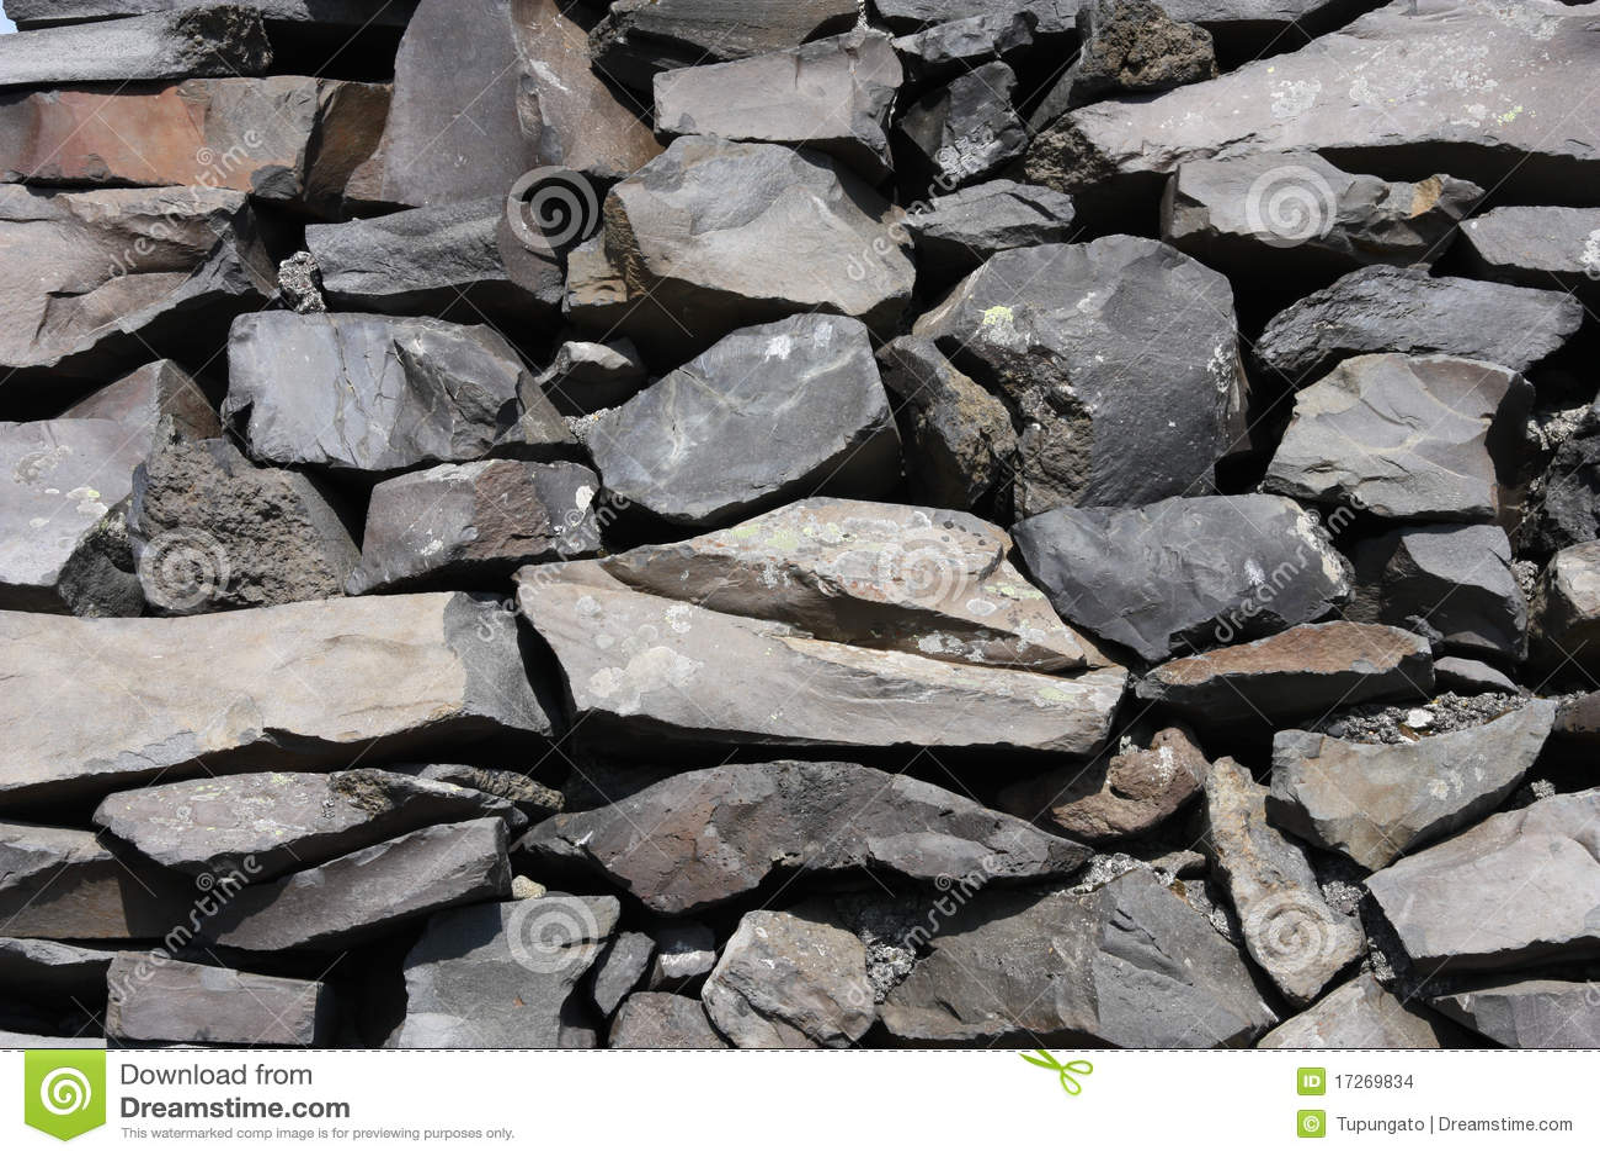 What Are Basalt Stones : Basalt stone texture stock photo image of stones